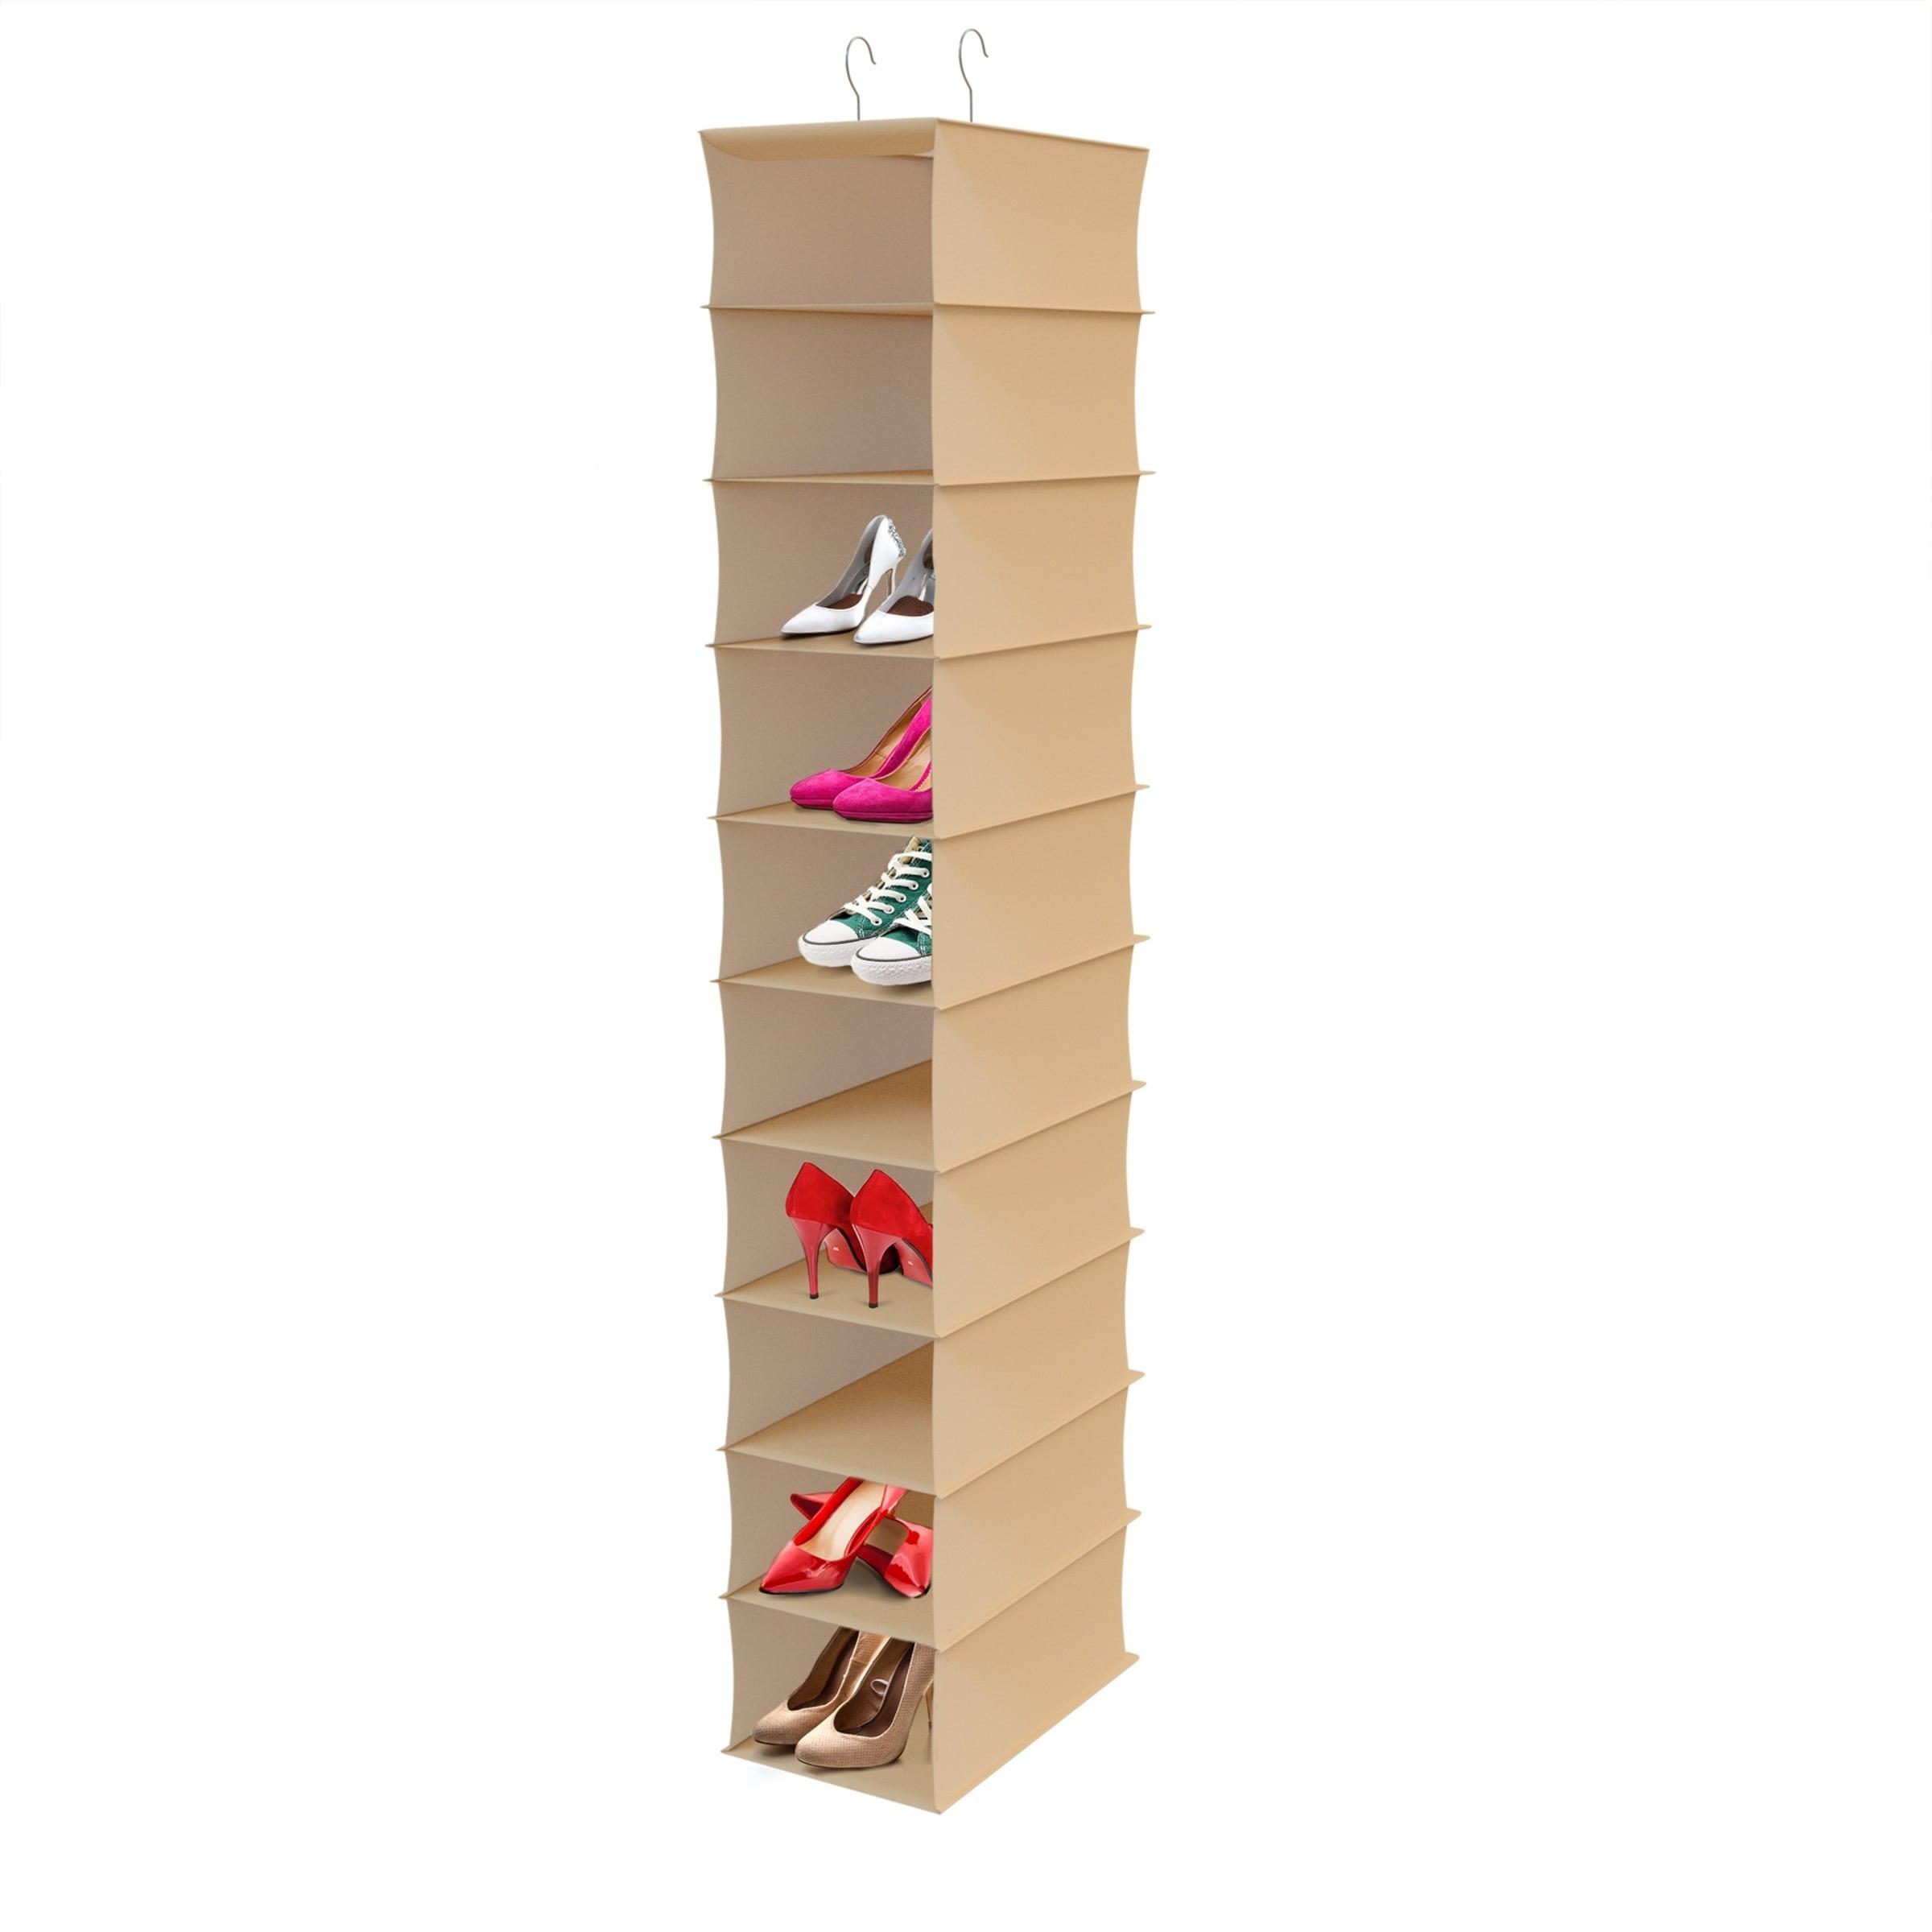 Hanging Shoe Organizer 10 Shelf Vertical Closet Storage For Heels Flats Sneakers E Saving By Lavish Home